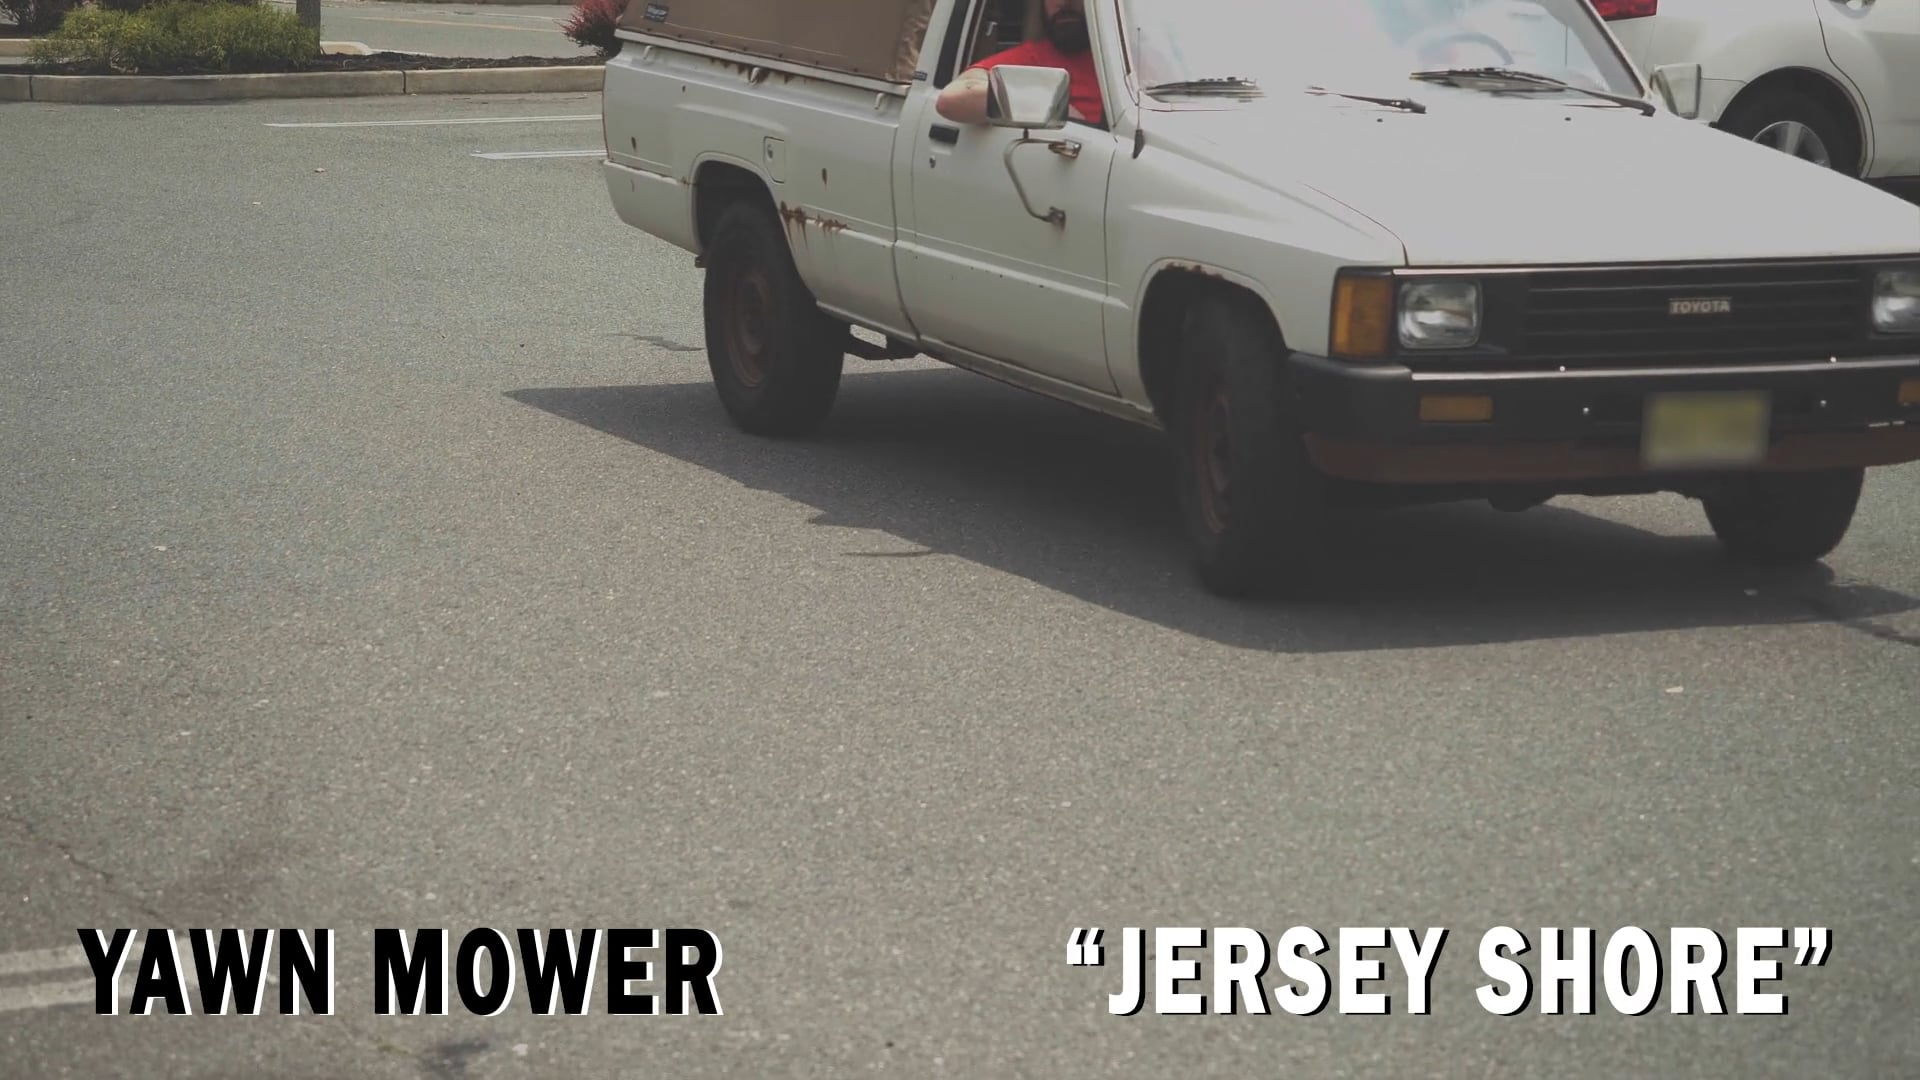 Yawn Mower Jersey Shore Music Video